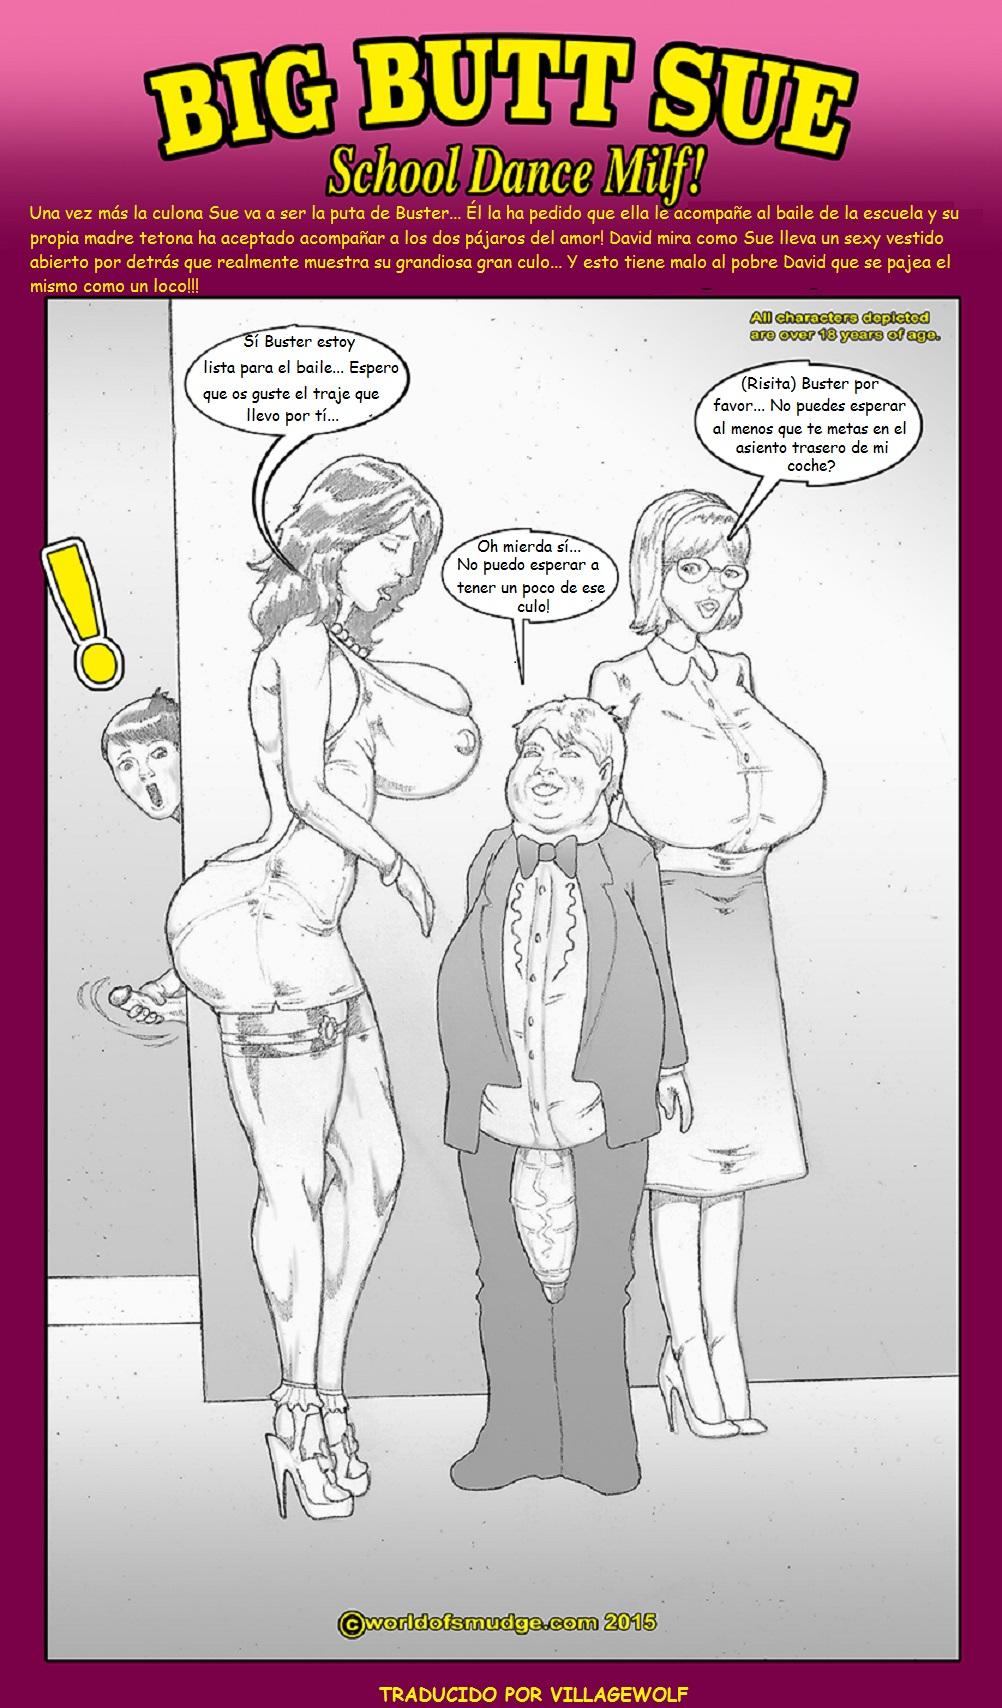 Big butt sue porn comics every